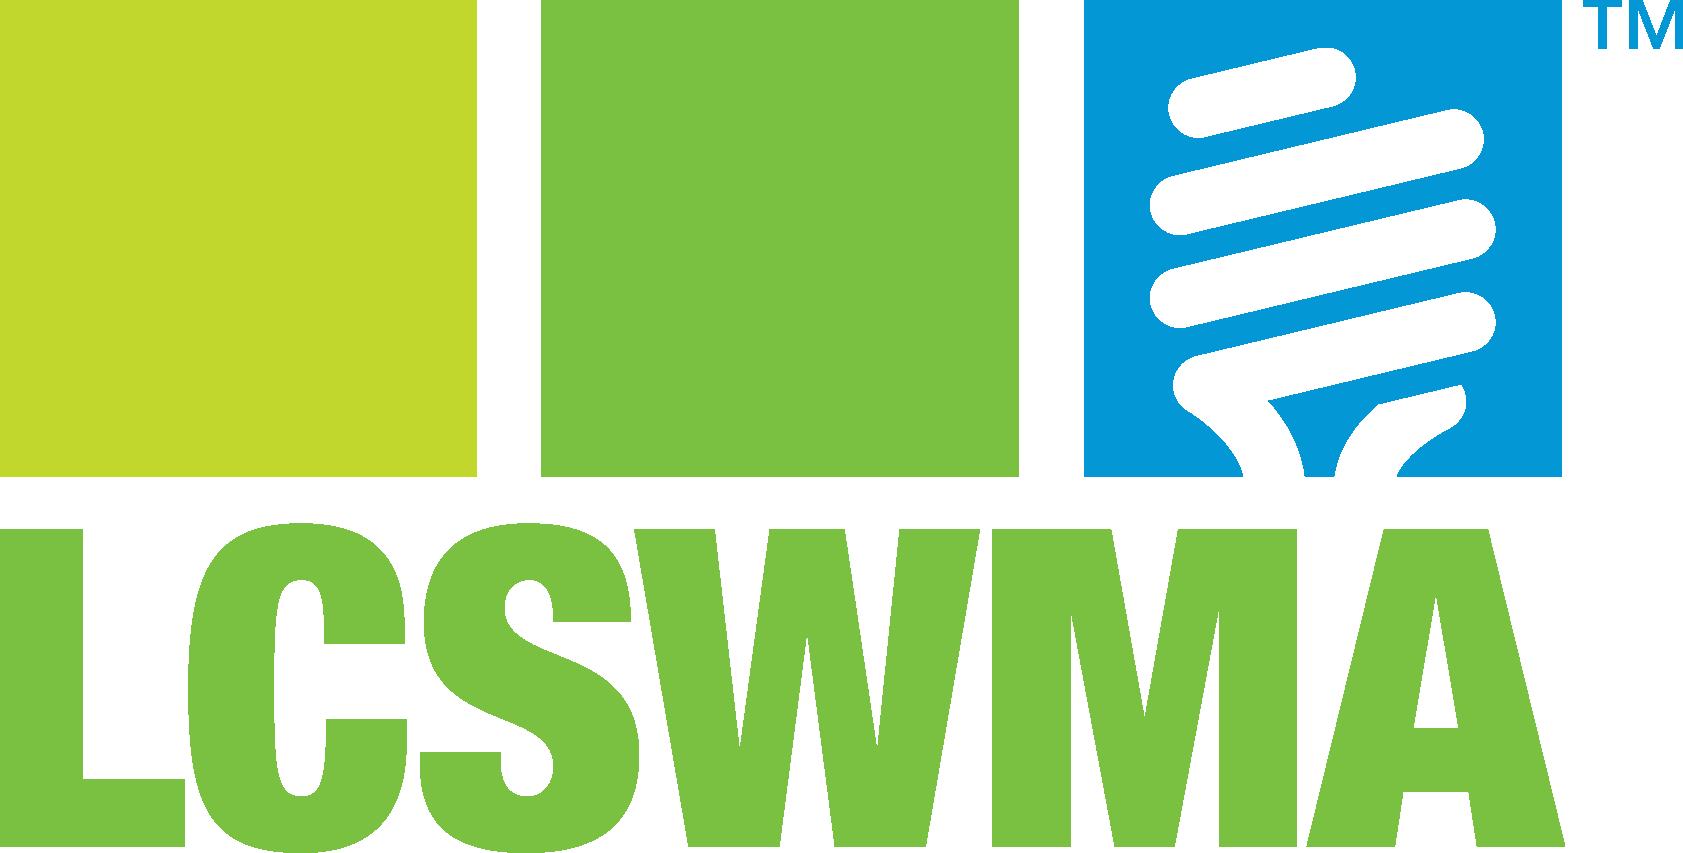 LCSWMA's Online Newsroom logo